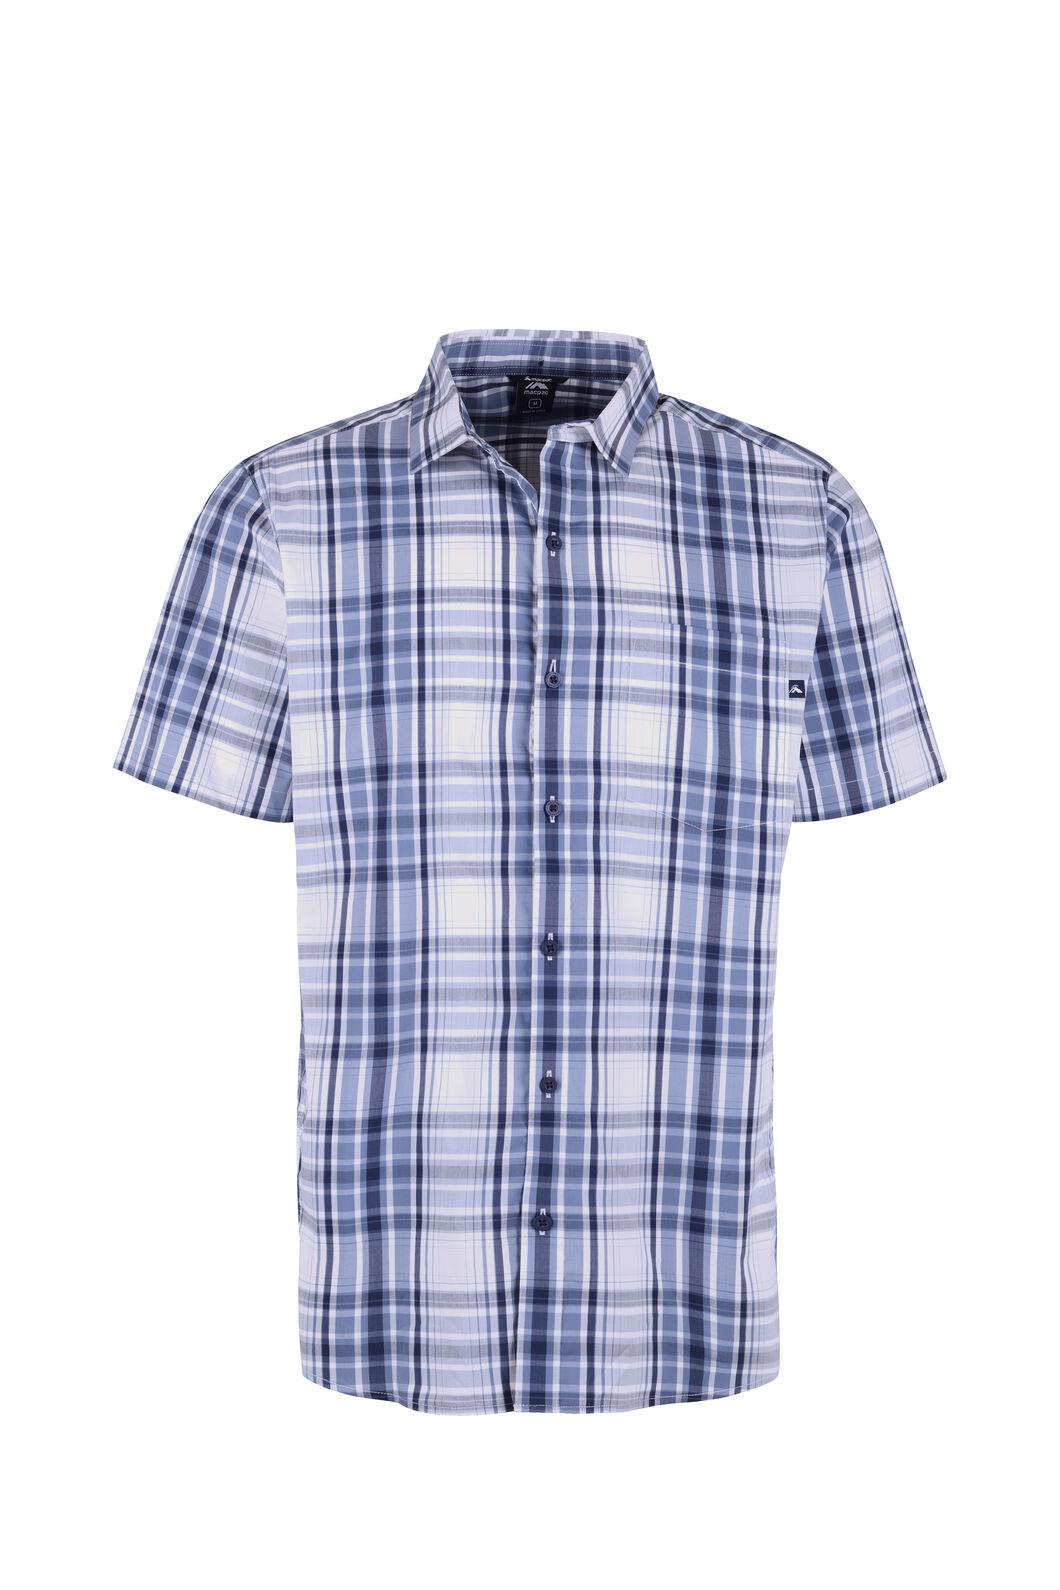 Macpac Crossroad Short Sleeve Shirt - Men's, Flint Stone, hi-res